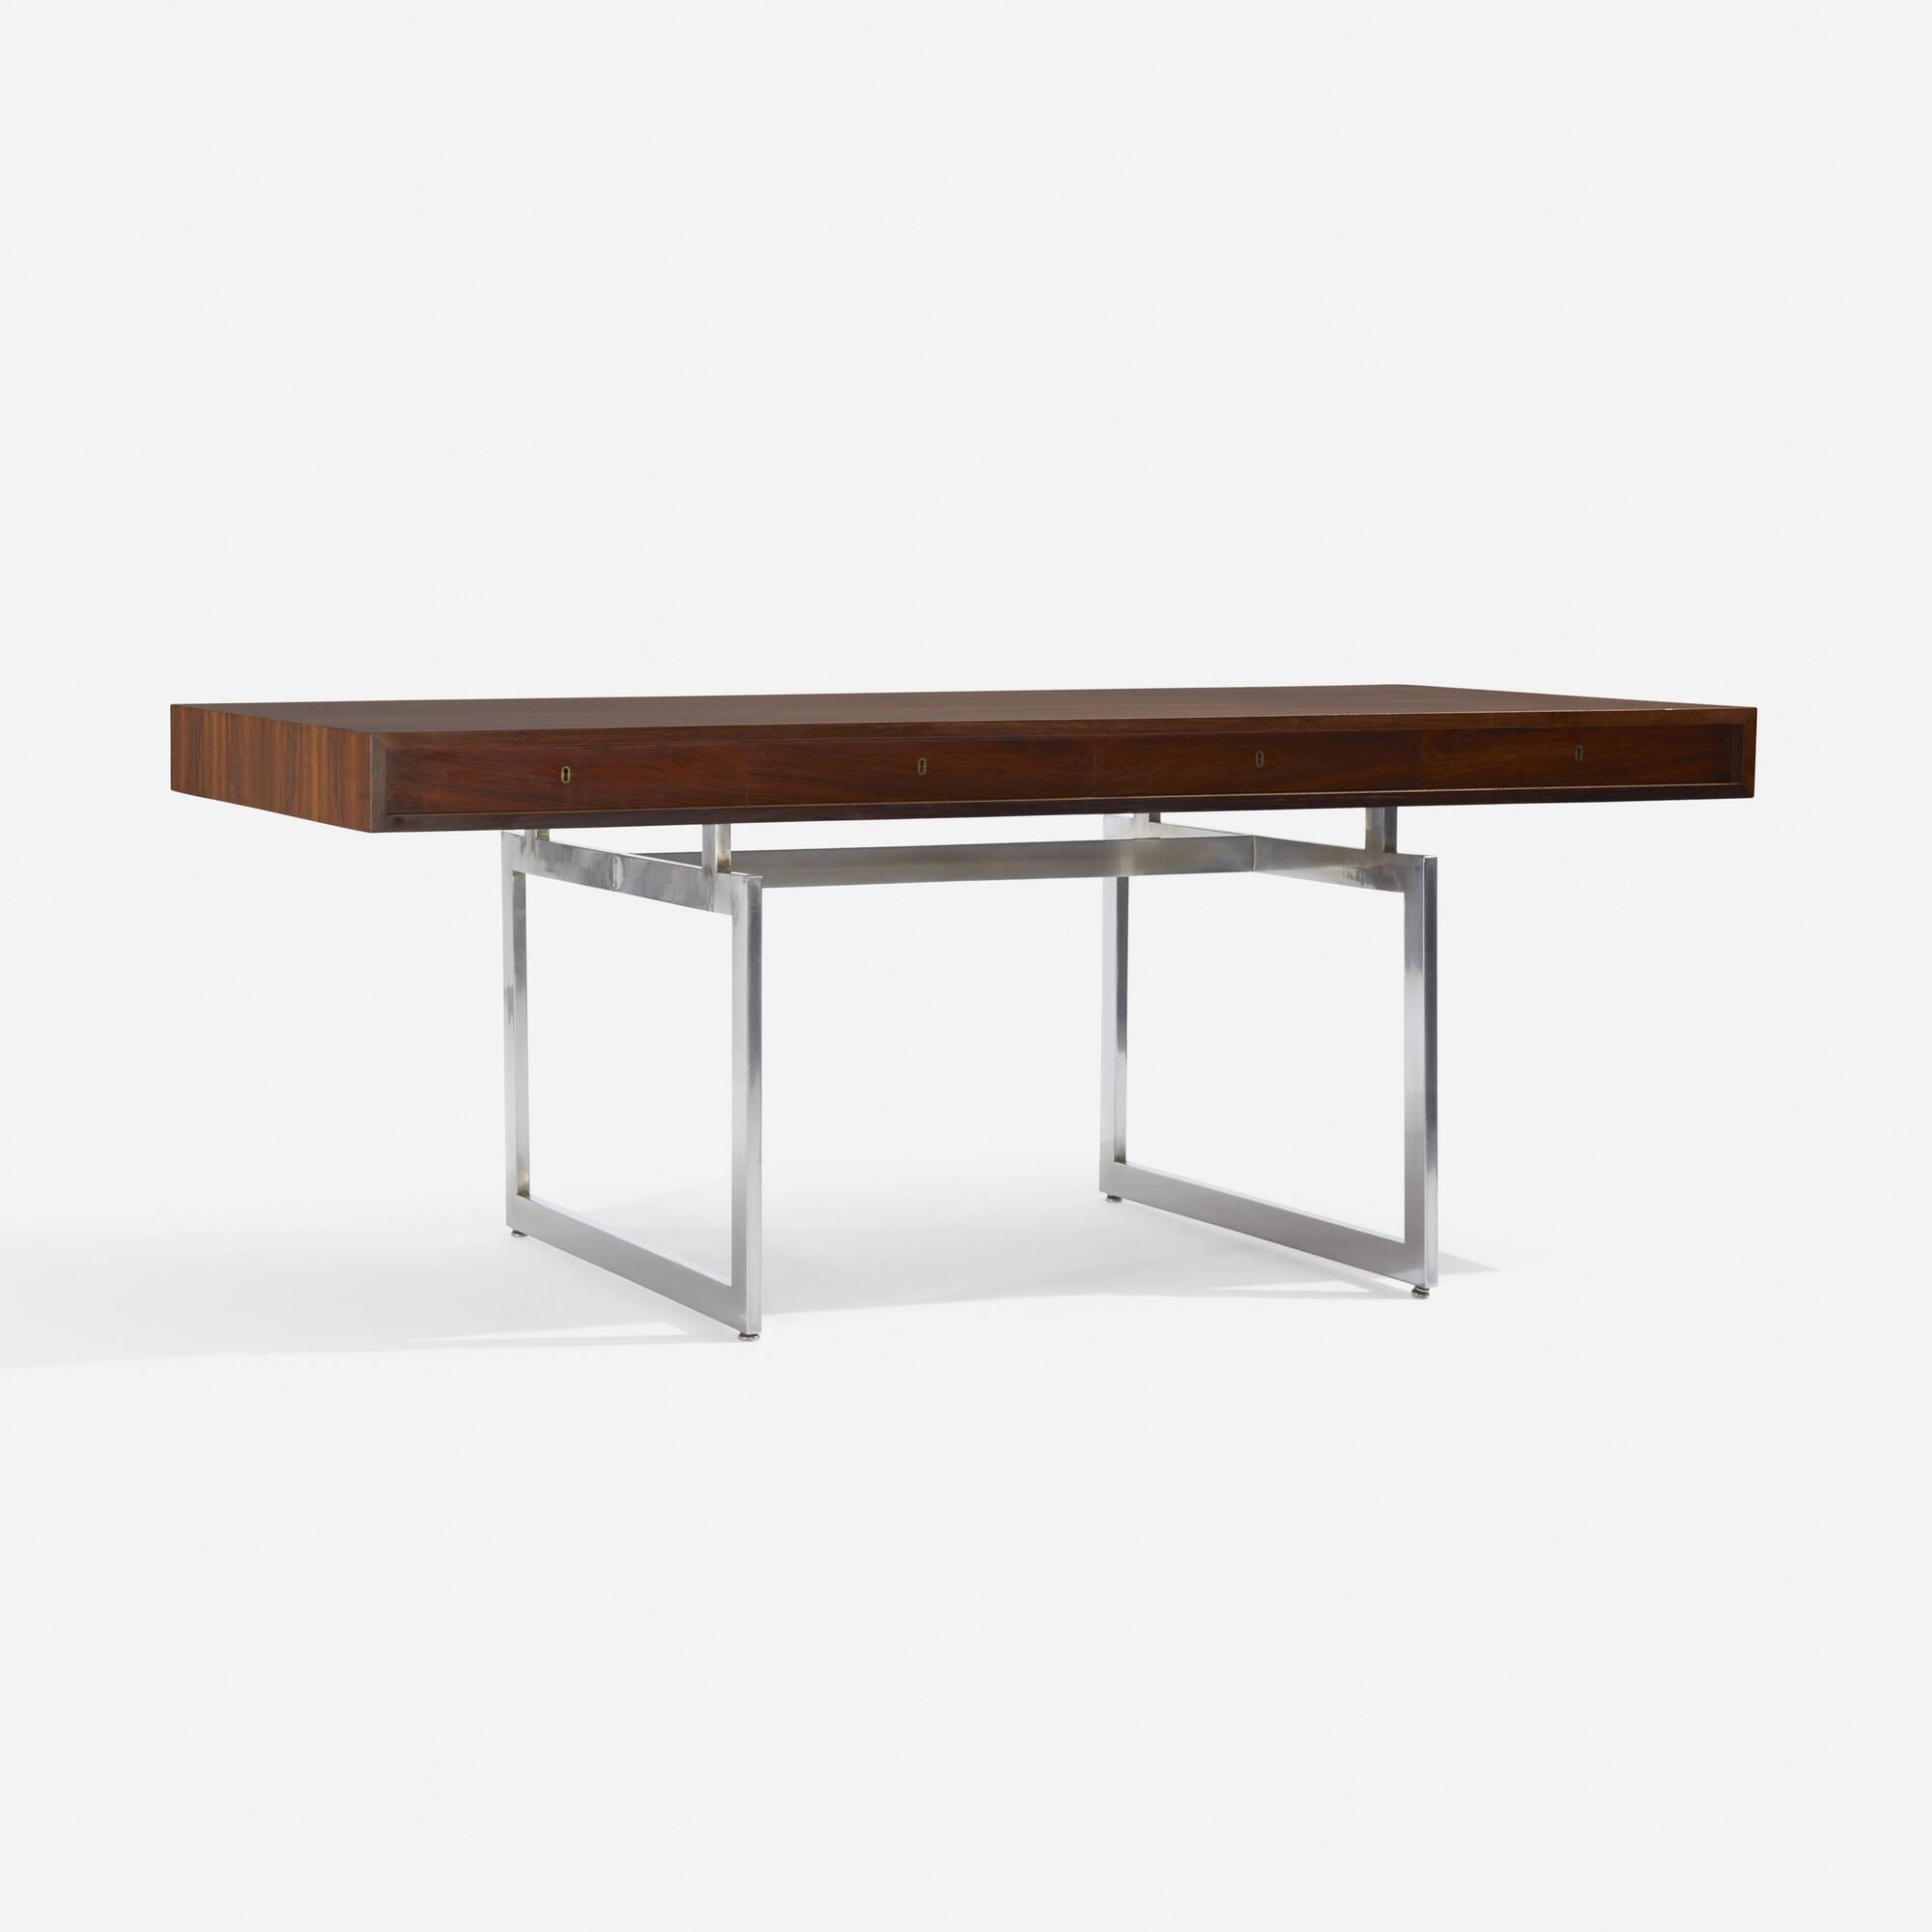 268: Bodil Kjaer / desk (1 of 3)